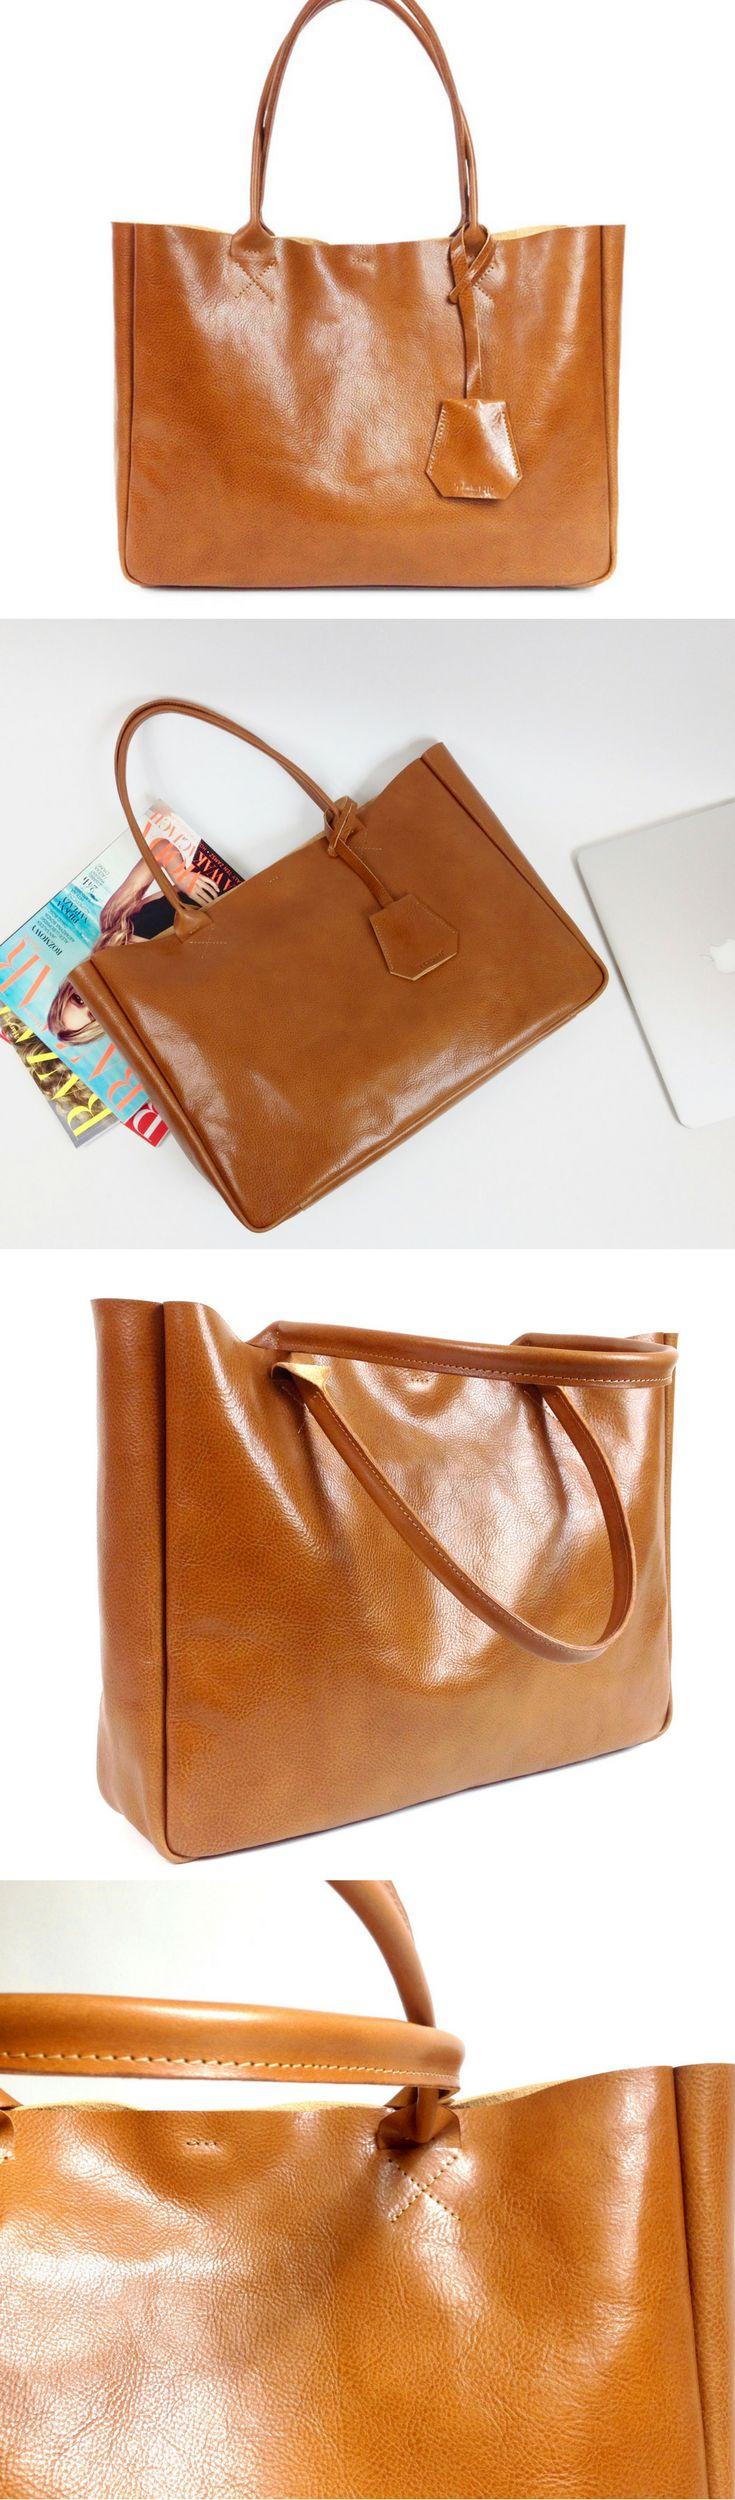 Handmade leather tote bag. Everyday leather handbag.